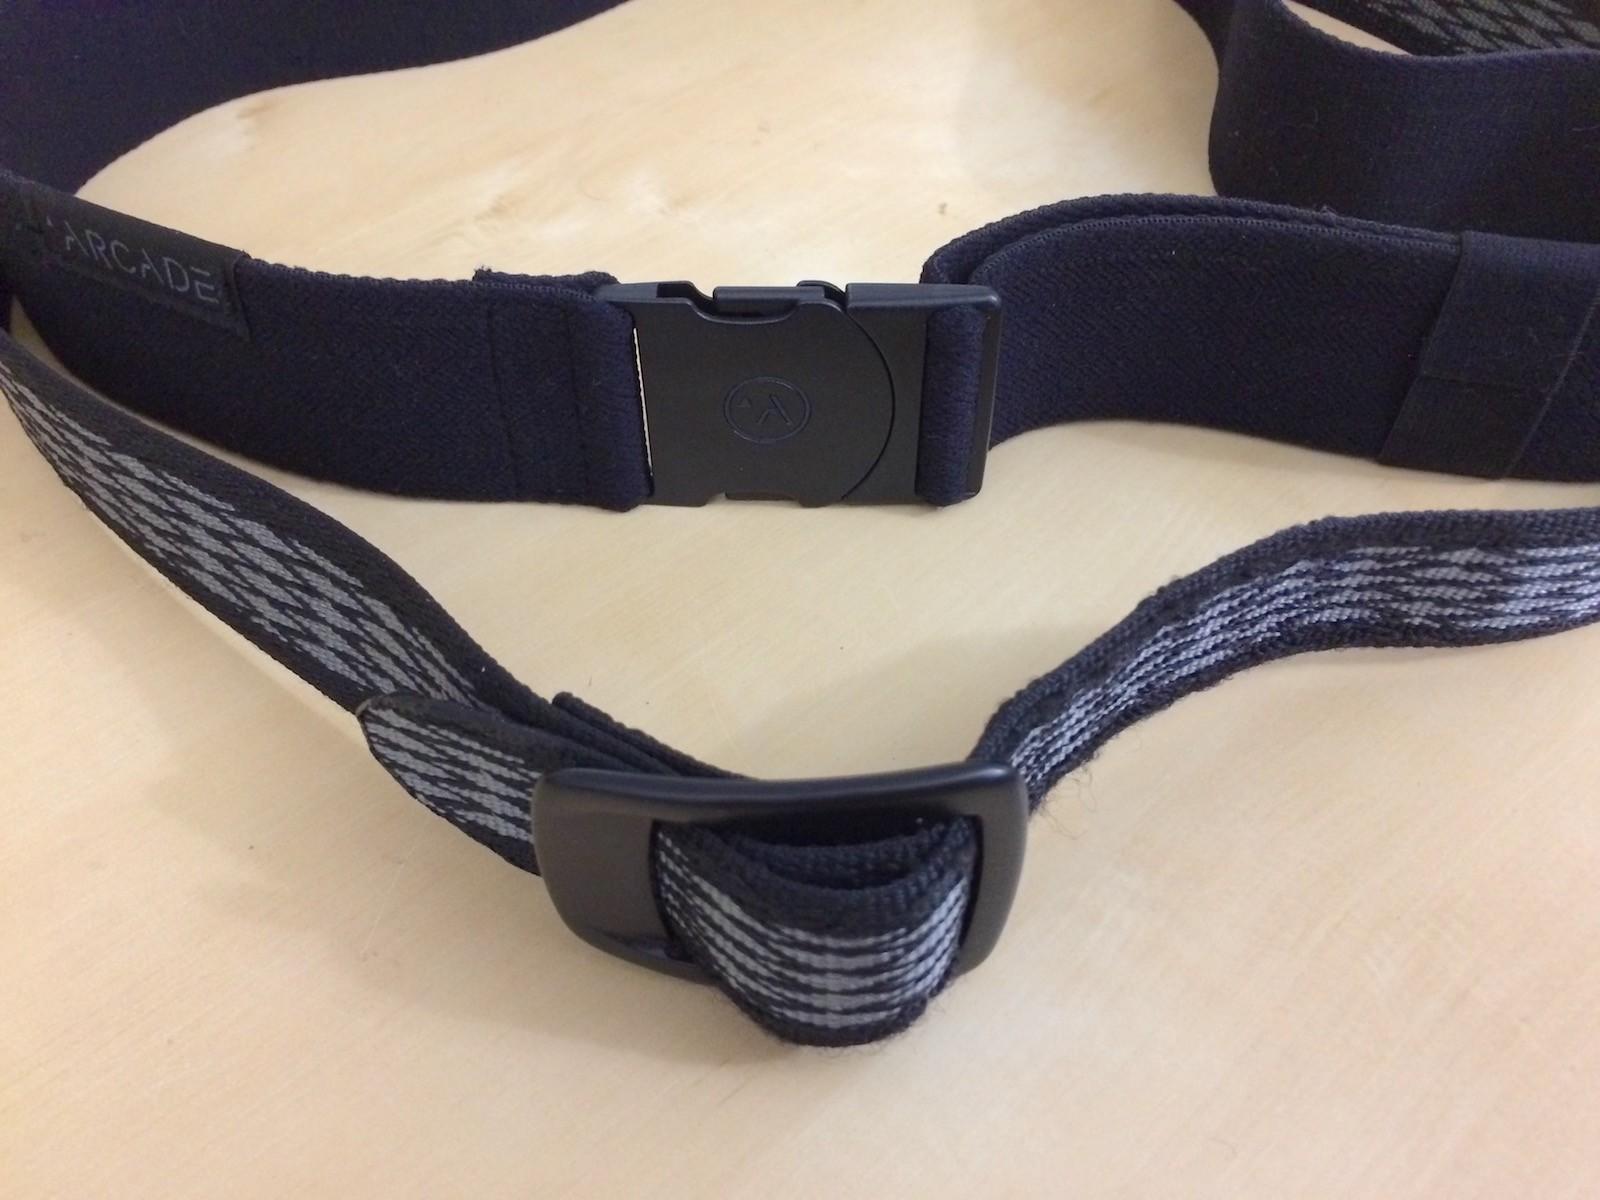 Arcade Belt vs webbing belt